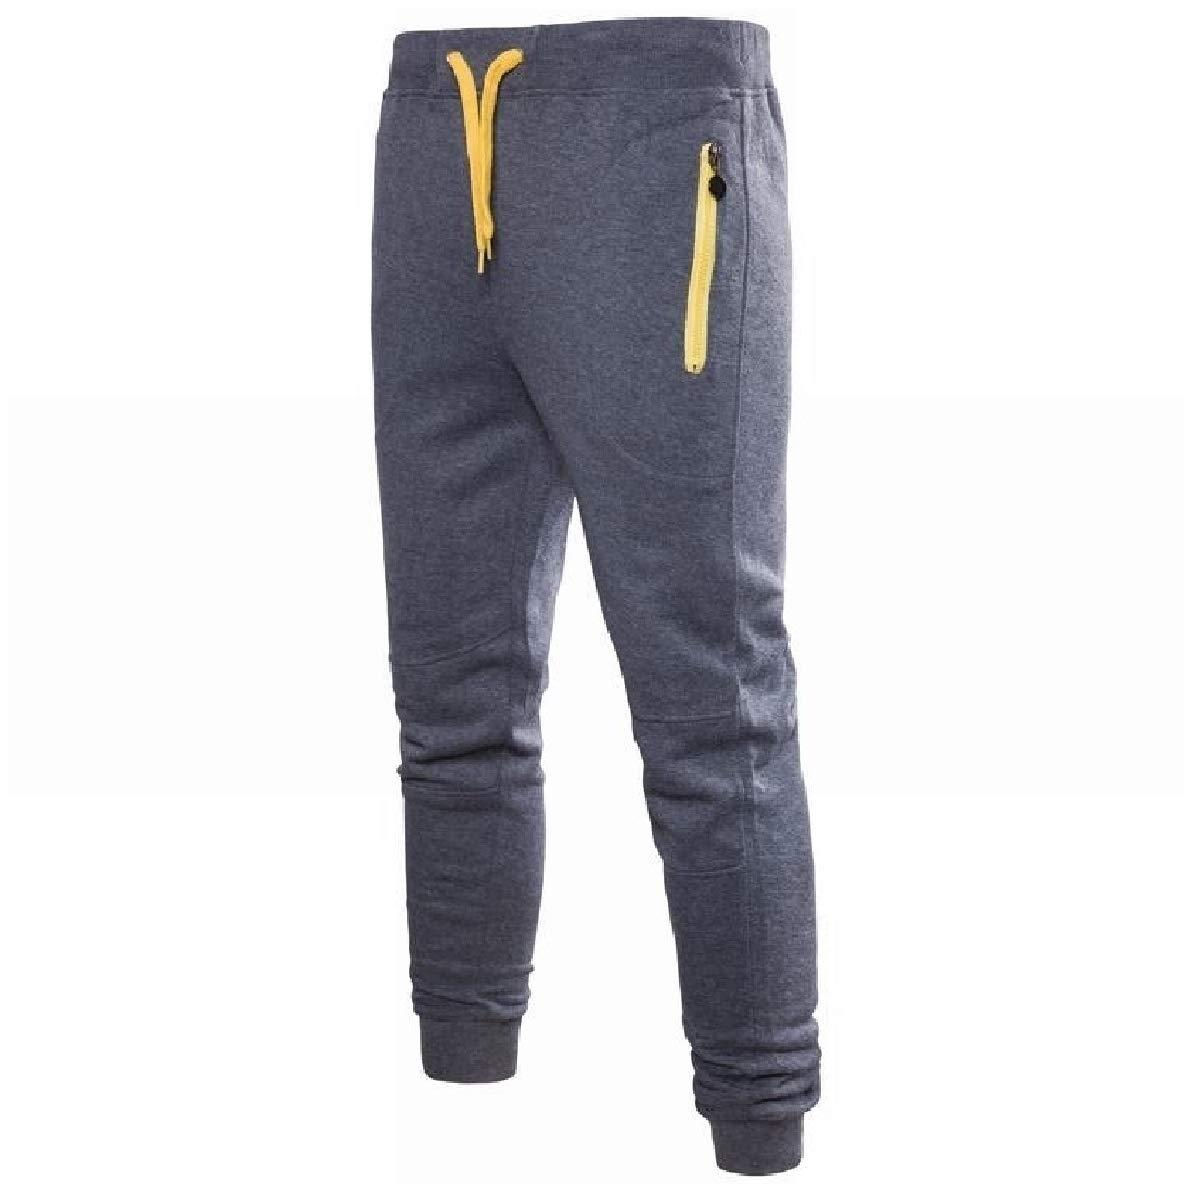 Zimase Mens Drawstring Leisure Elastic Waist Plus-Size Pocket Zip Sweat Pants